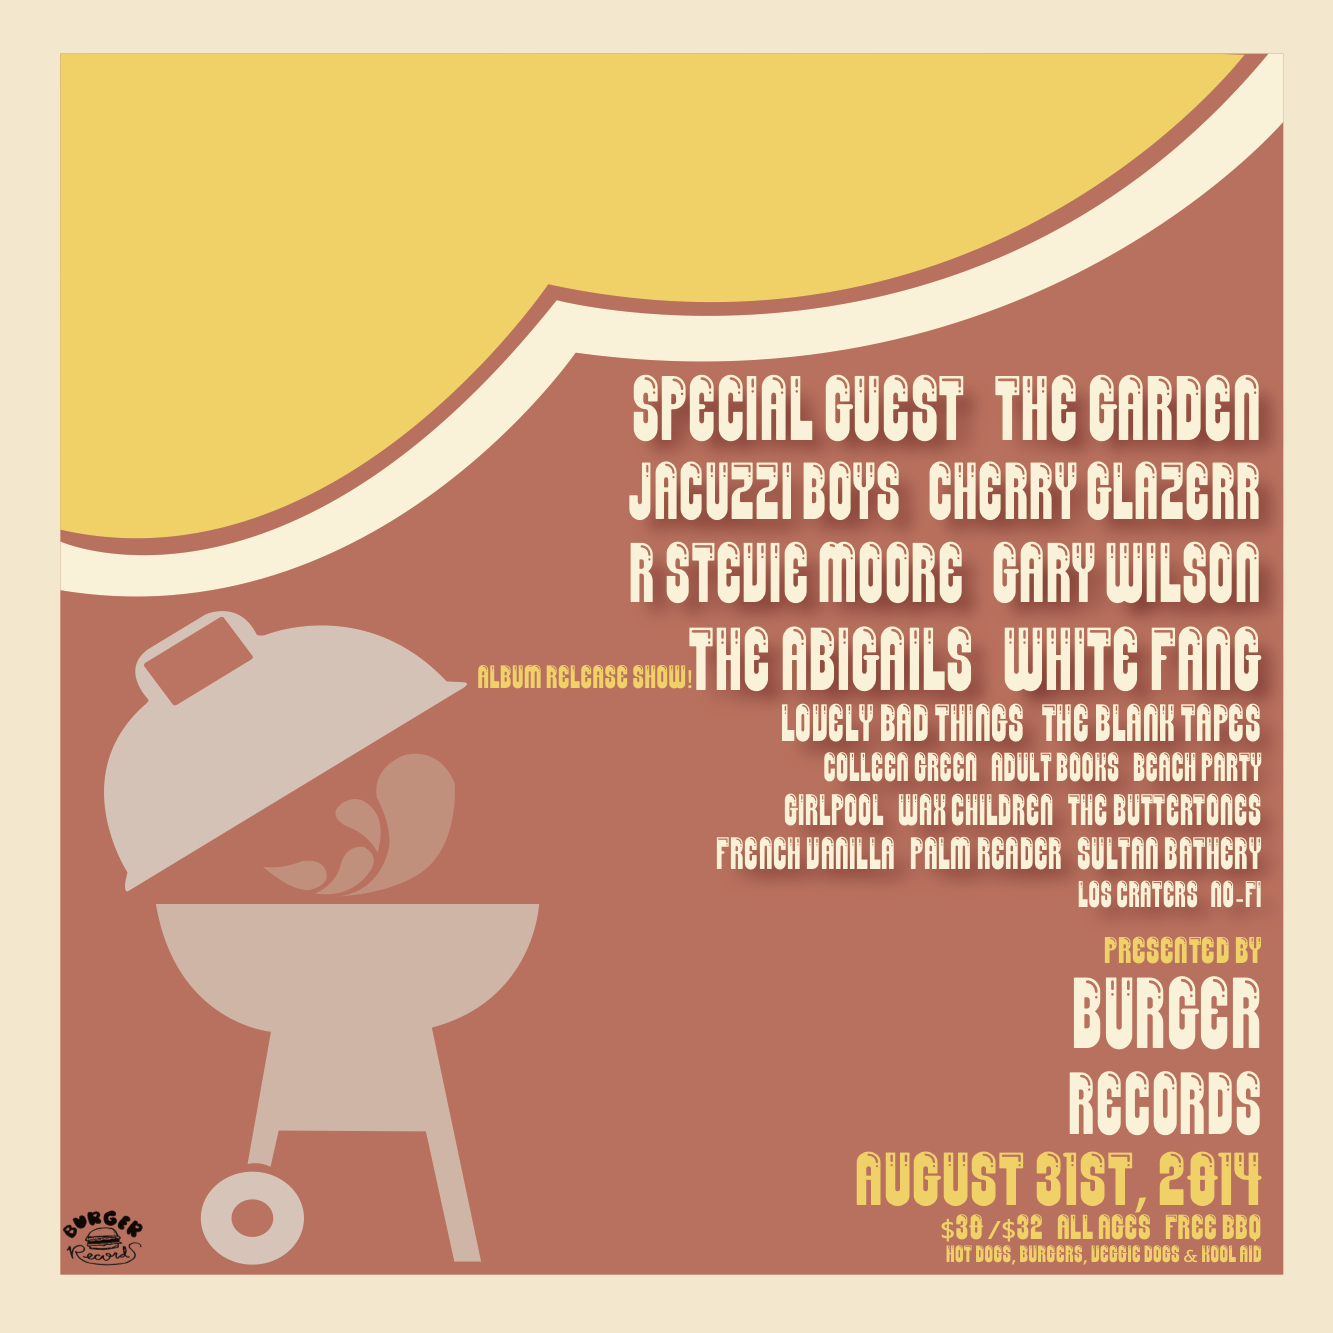 Burger-Records-Poster-Anders-Larsson-Gary-Wilson.jpg